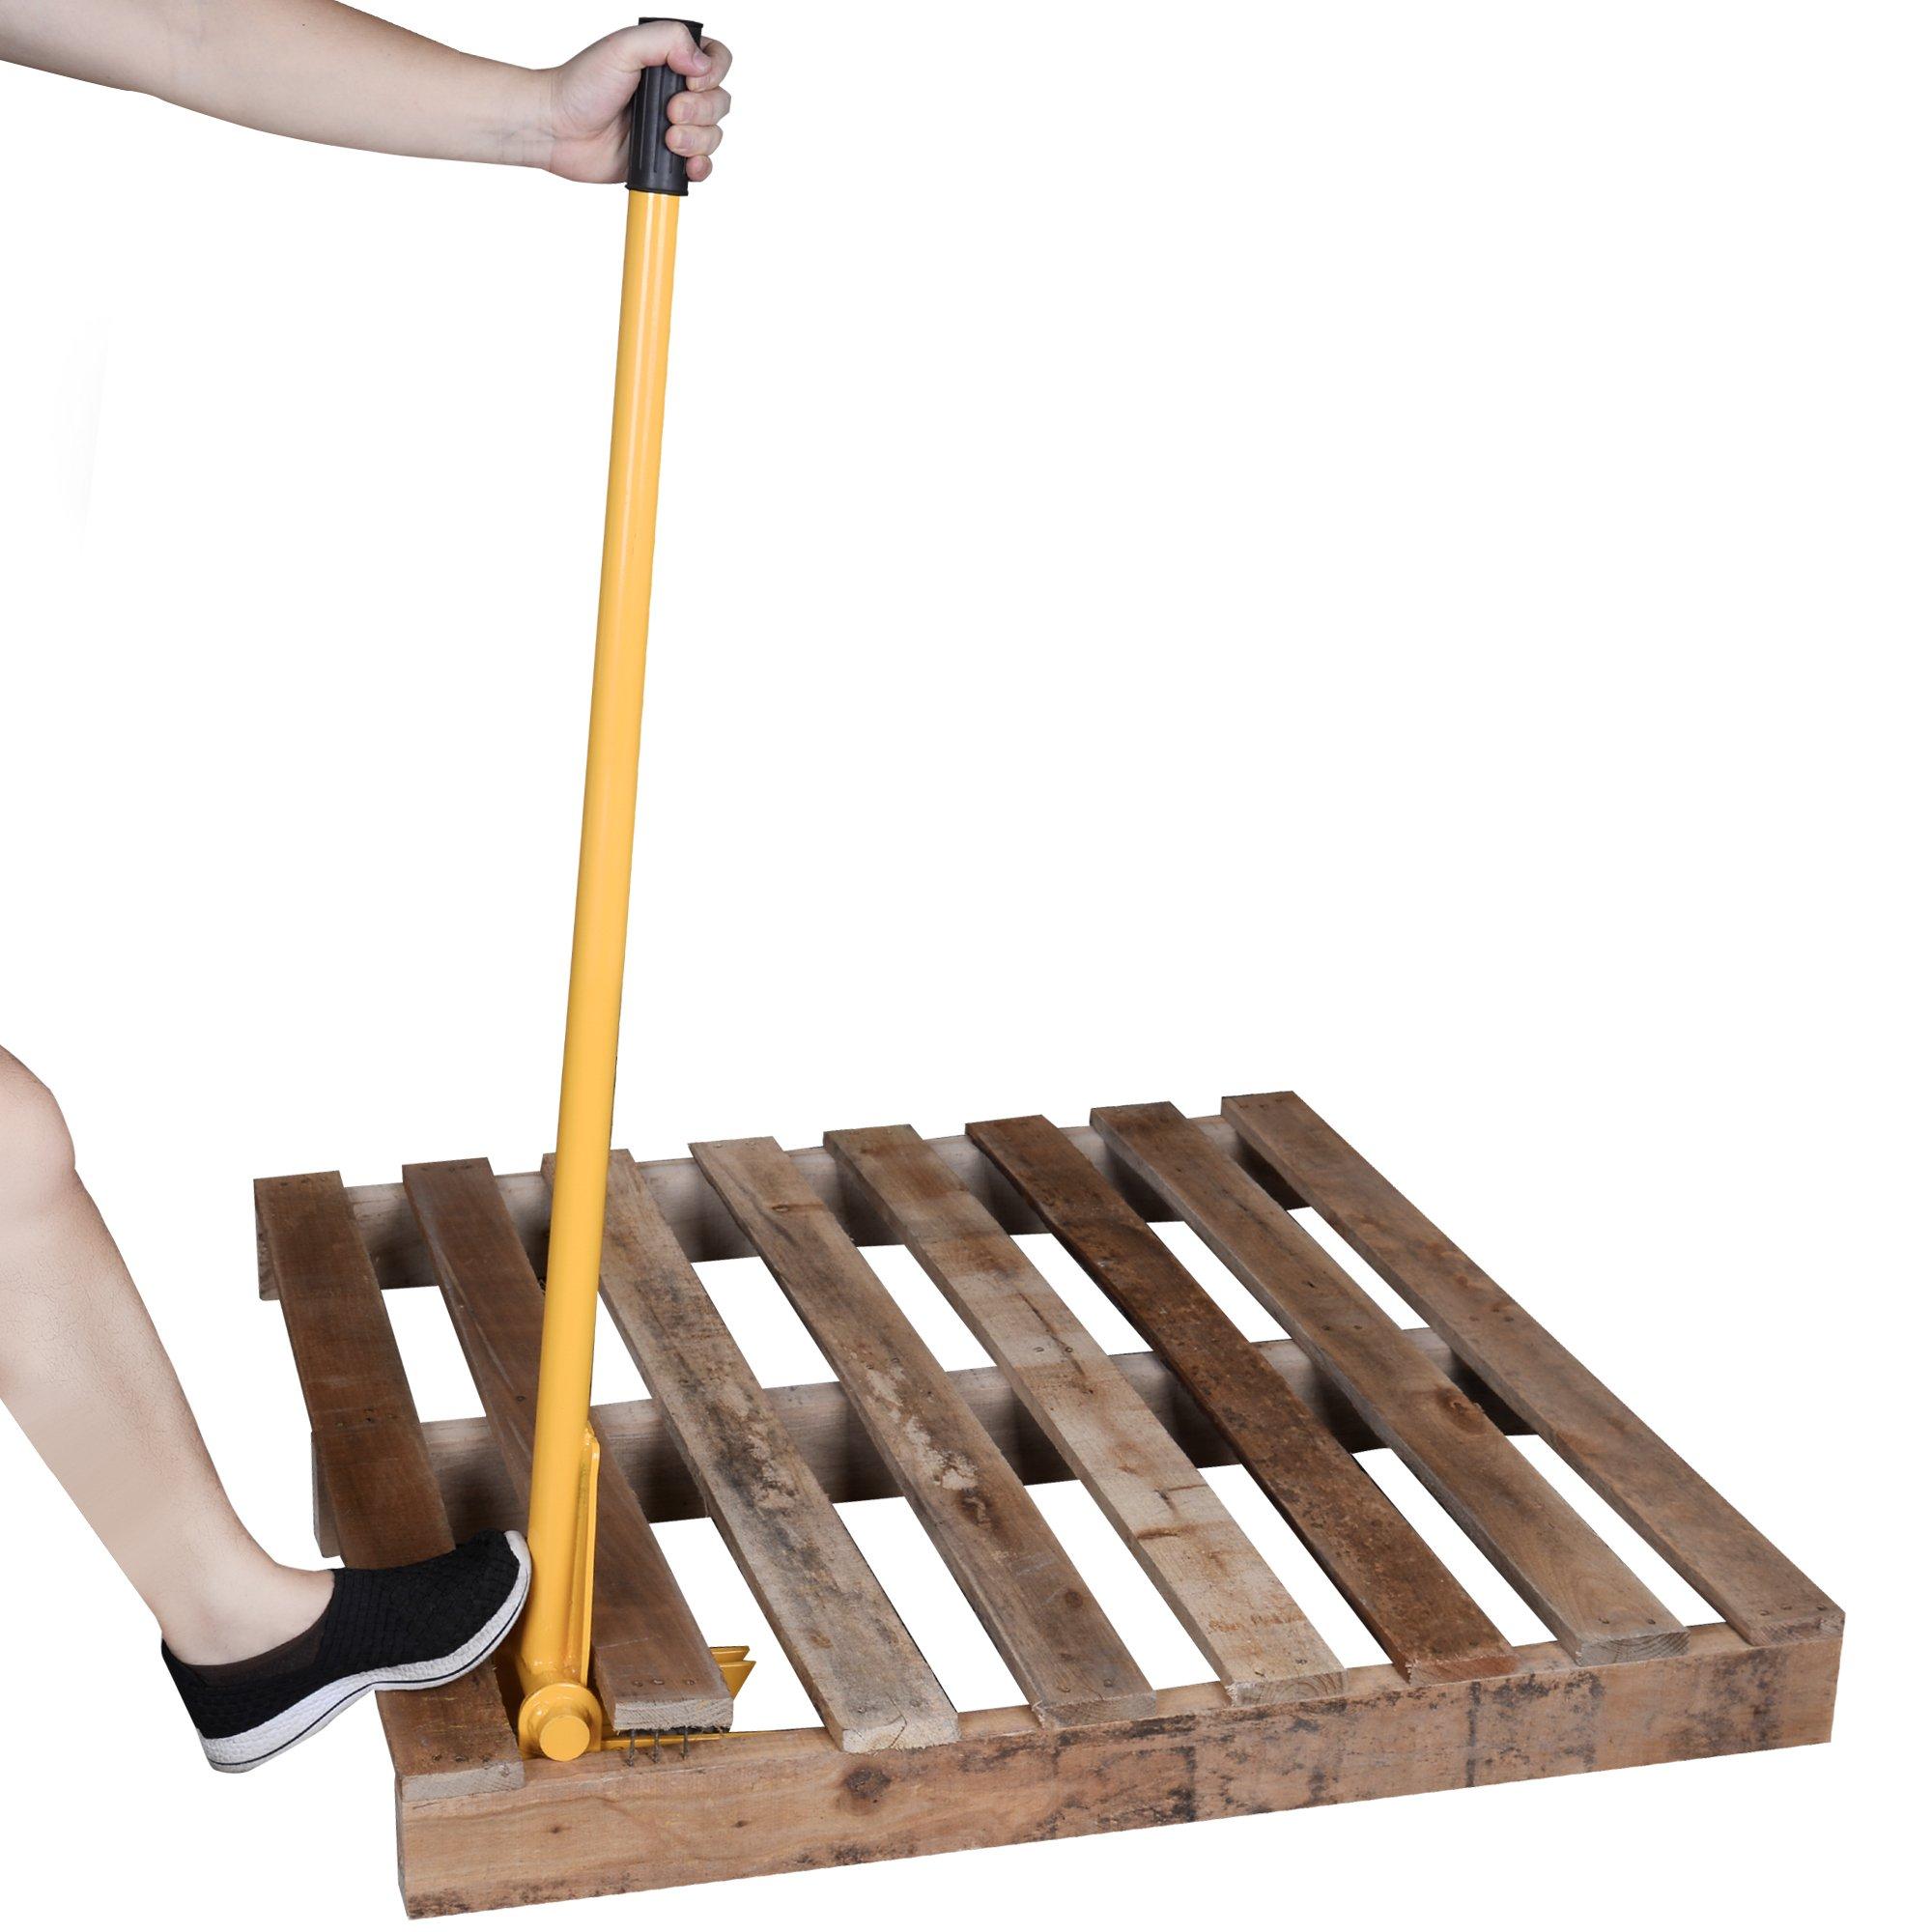 TIME SAVER - Pallet Buster Industrial Pry Bar For Easy Wood Pallet Destruction and Dismantler Premium Global Wood Breaker For Logistics Shippers Warehouses Anti Slip Grip Handles 41'' BL by 12Vmonster (Image #5)